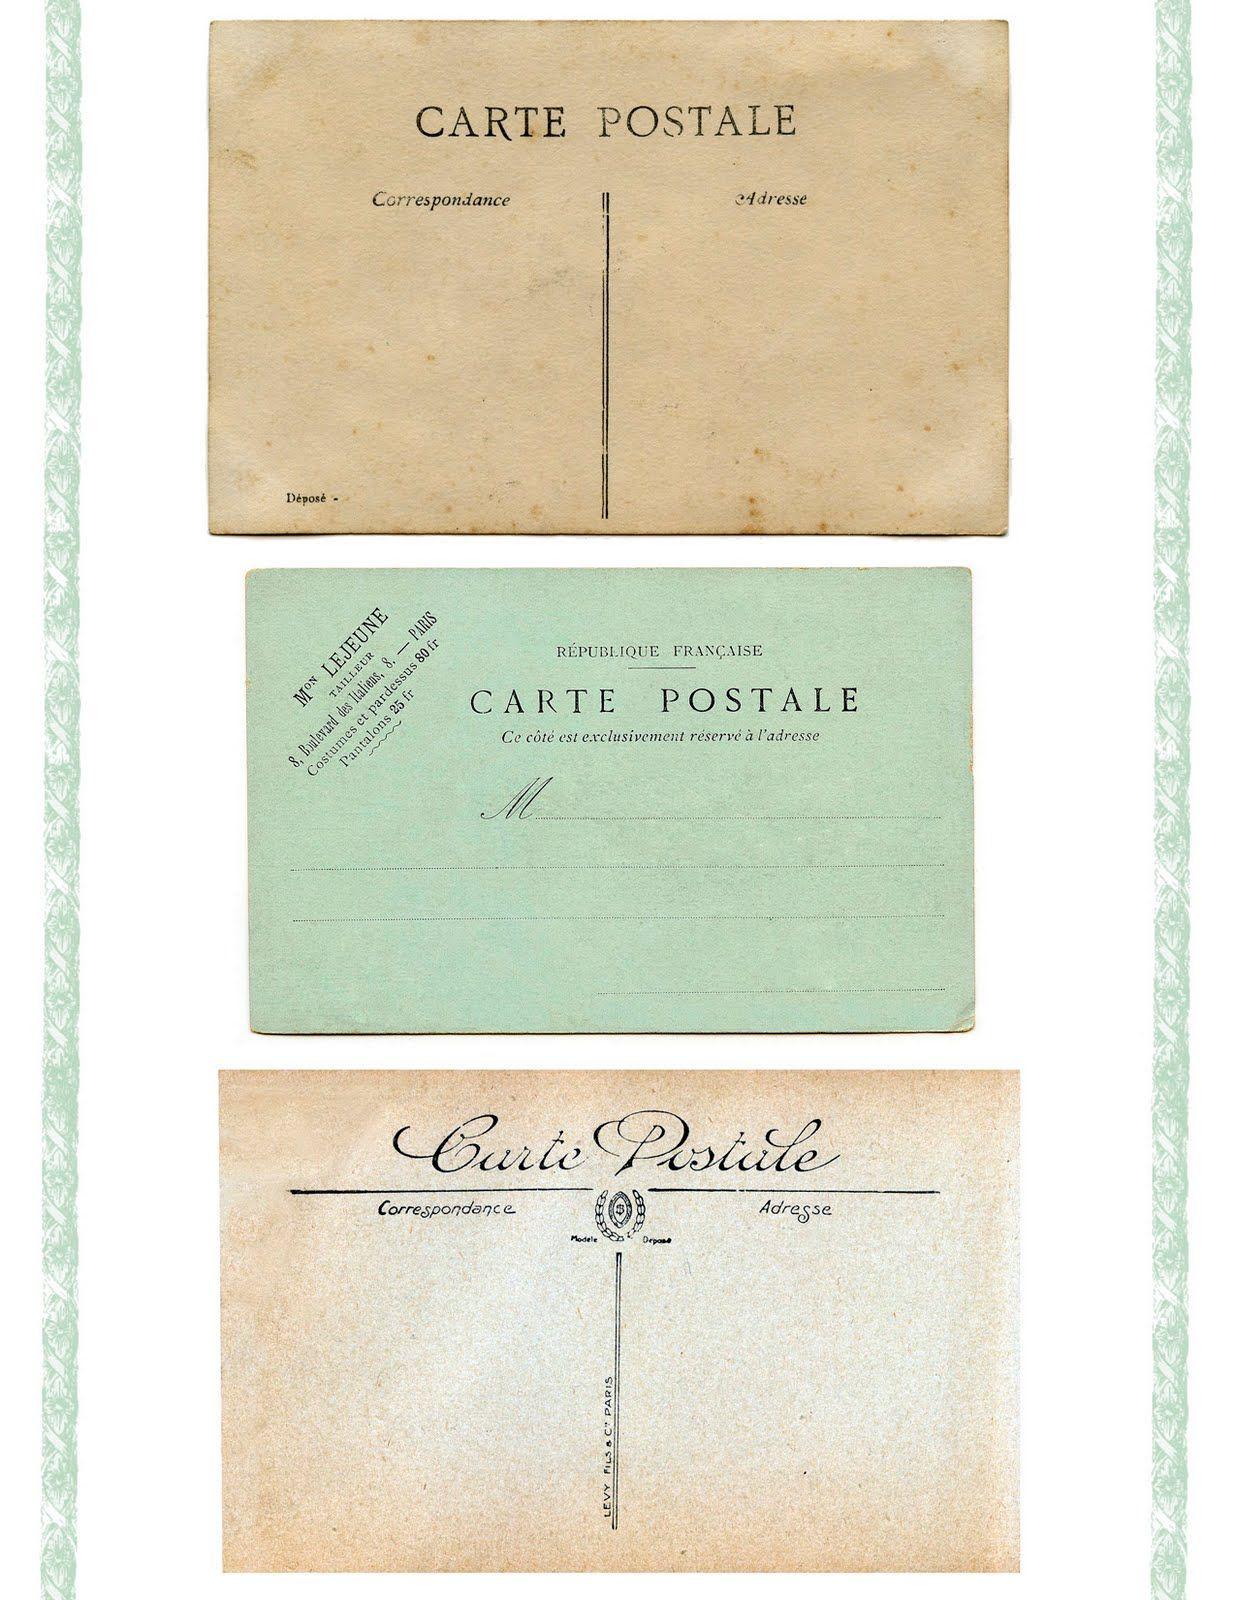 8 Vintage Ephemera Clip Art Carte Postale Postale Cartes